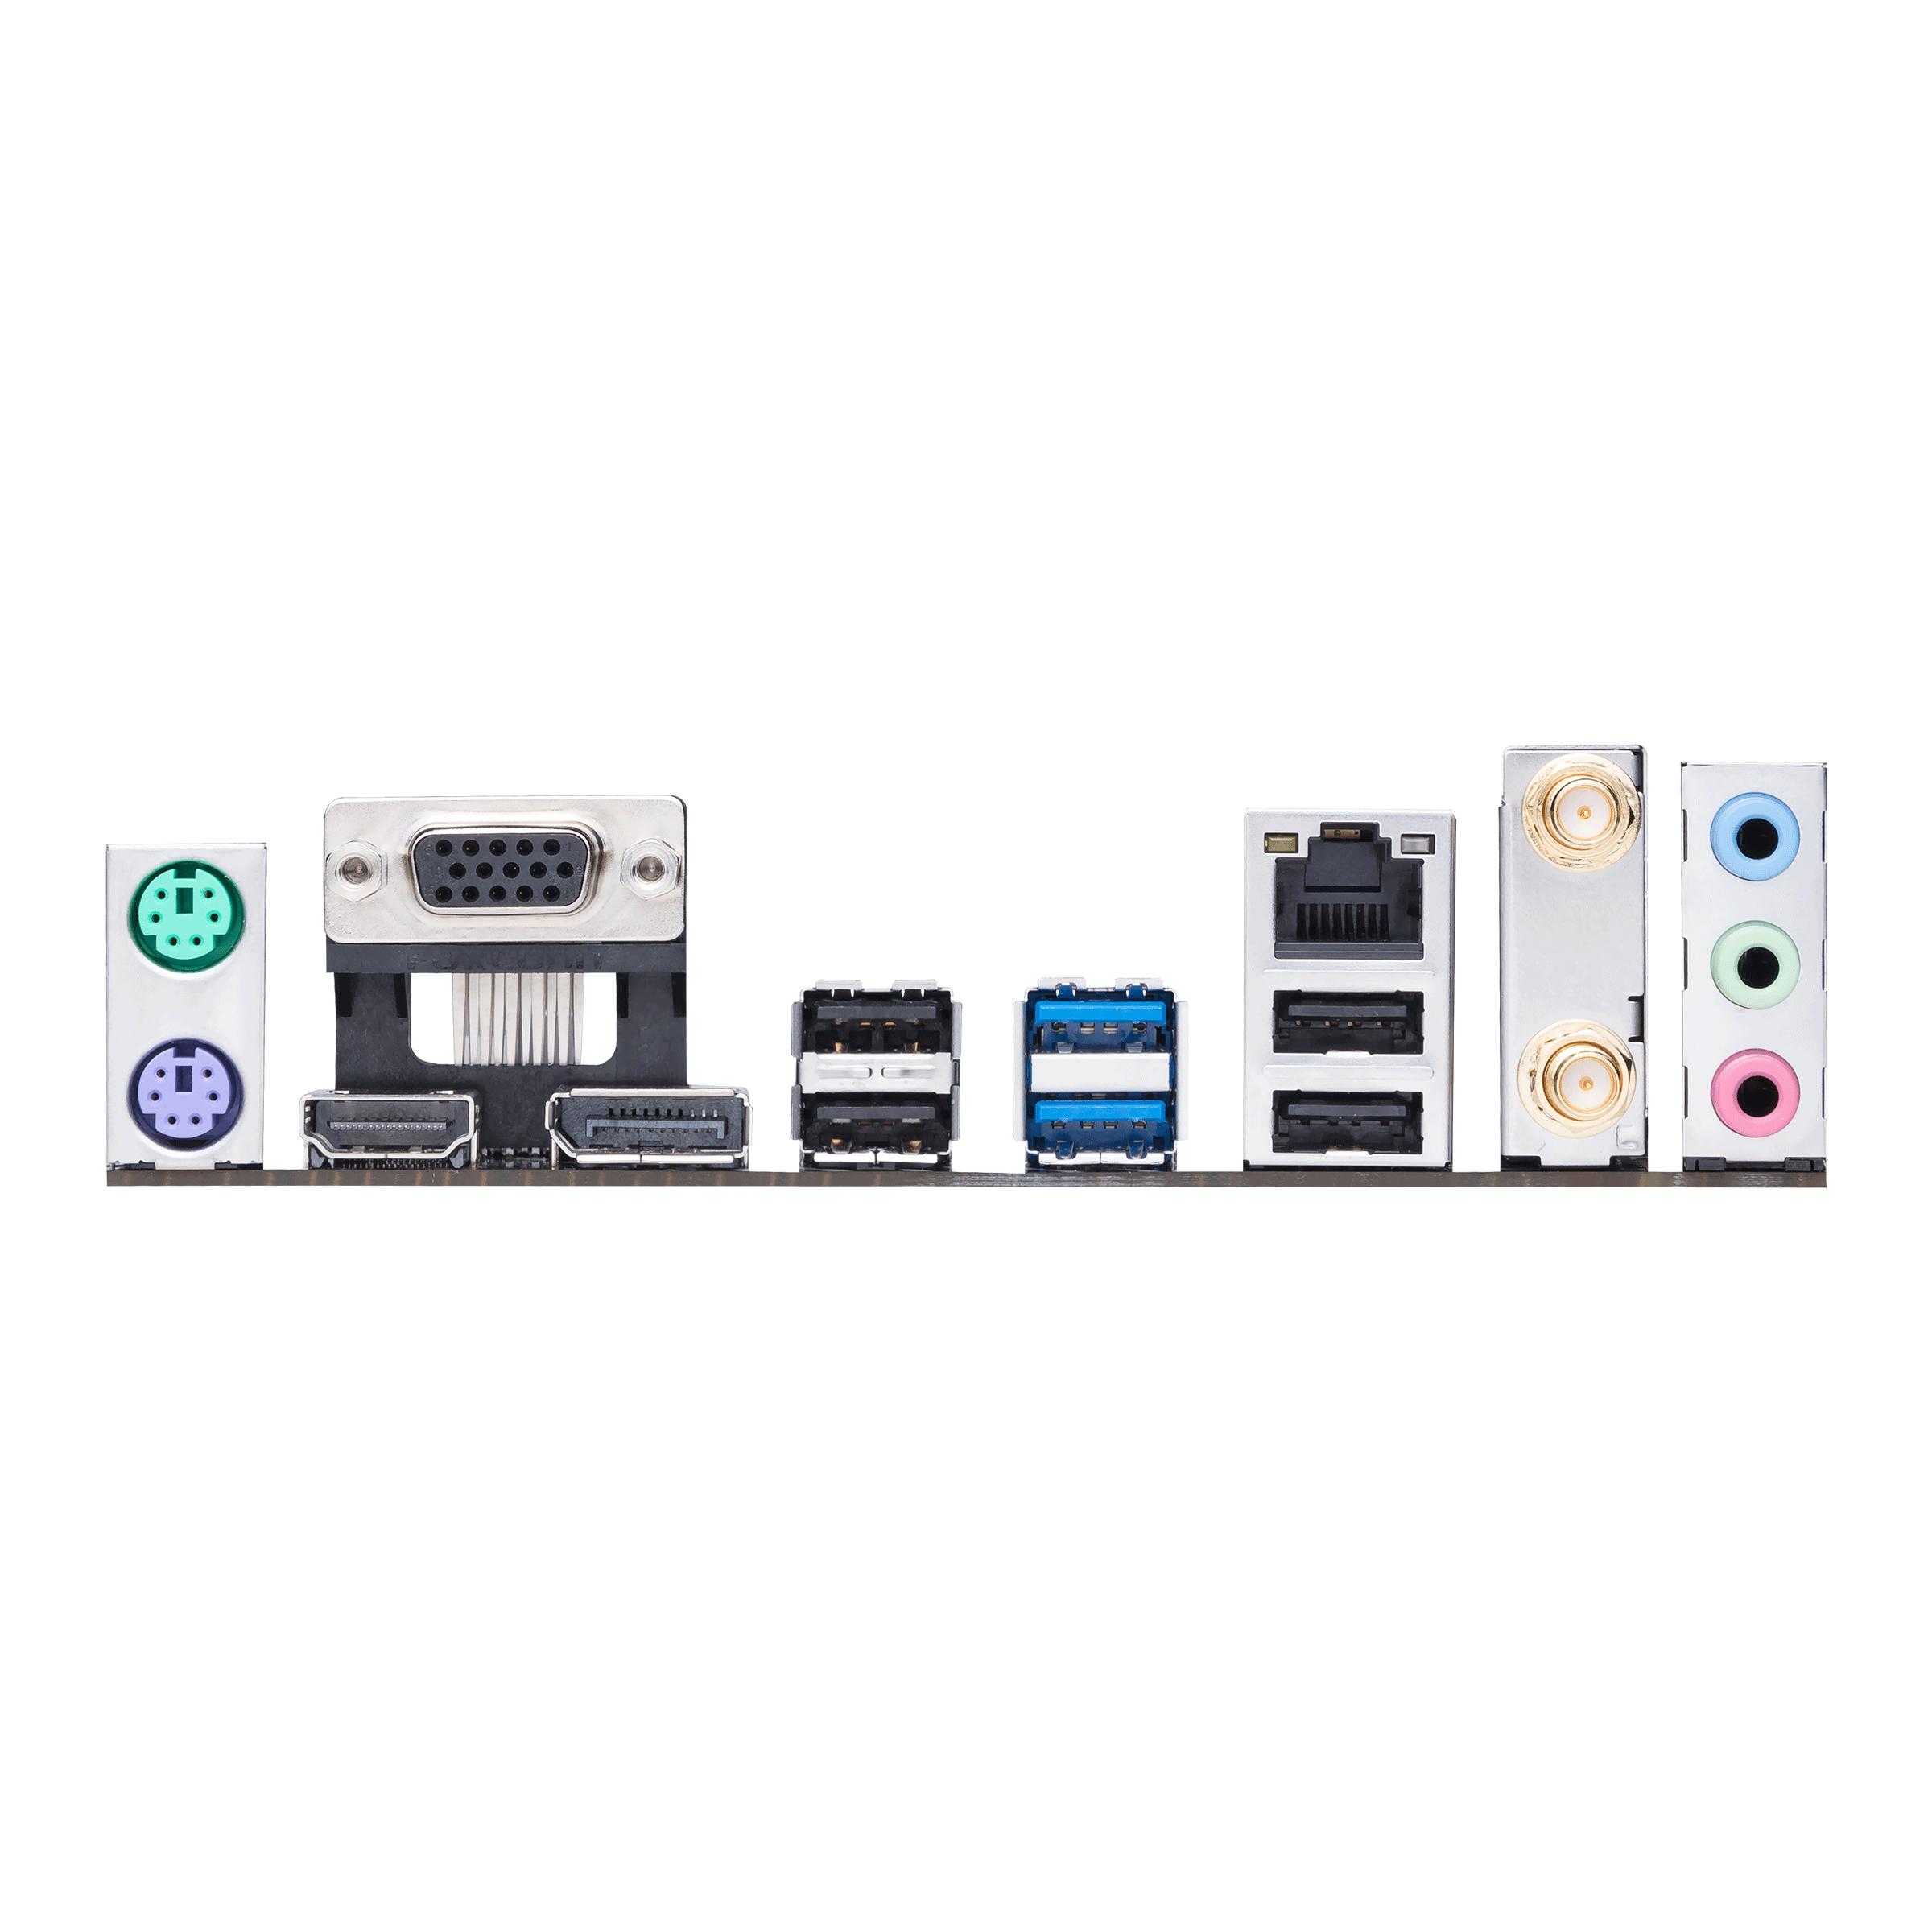 ASUS PRIME H510M-A WIFI - Motherboard - micro ATX - LGA1200-Sockel - H510 - USB 3.2 Gen 1 - Gigabit LAN, Wi-Fi, Bluetooth - Onboard-Grafik (CPU erforderlich)